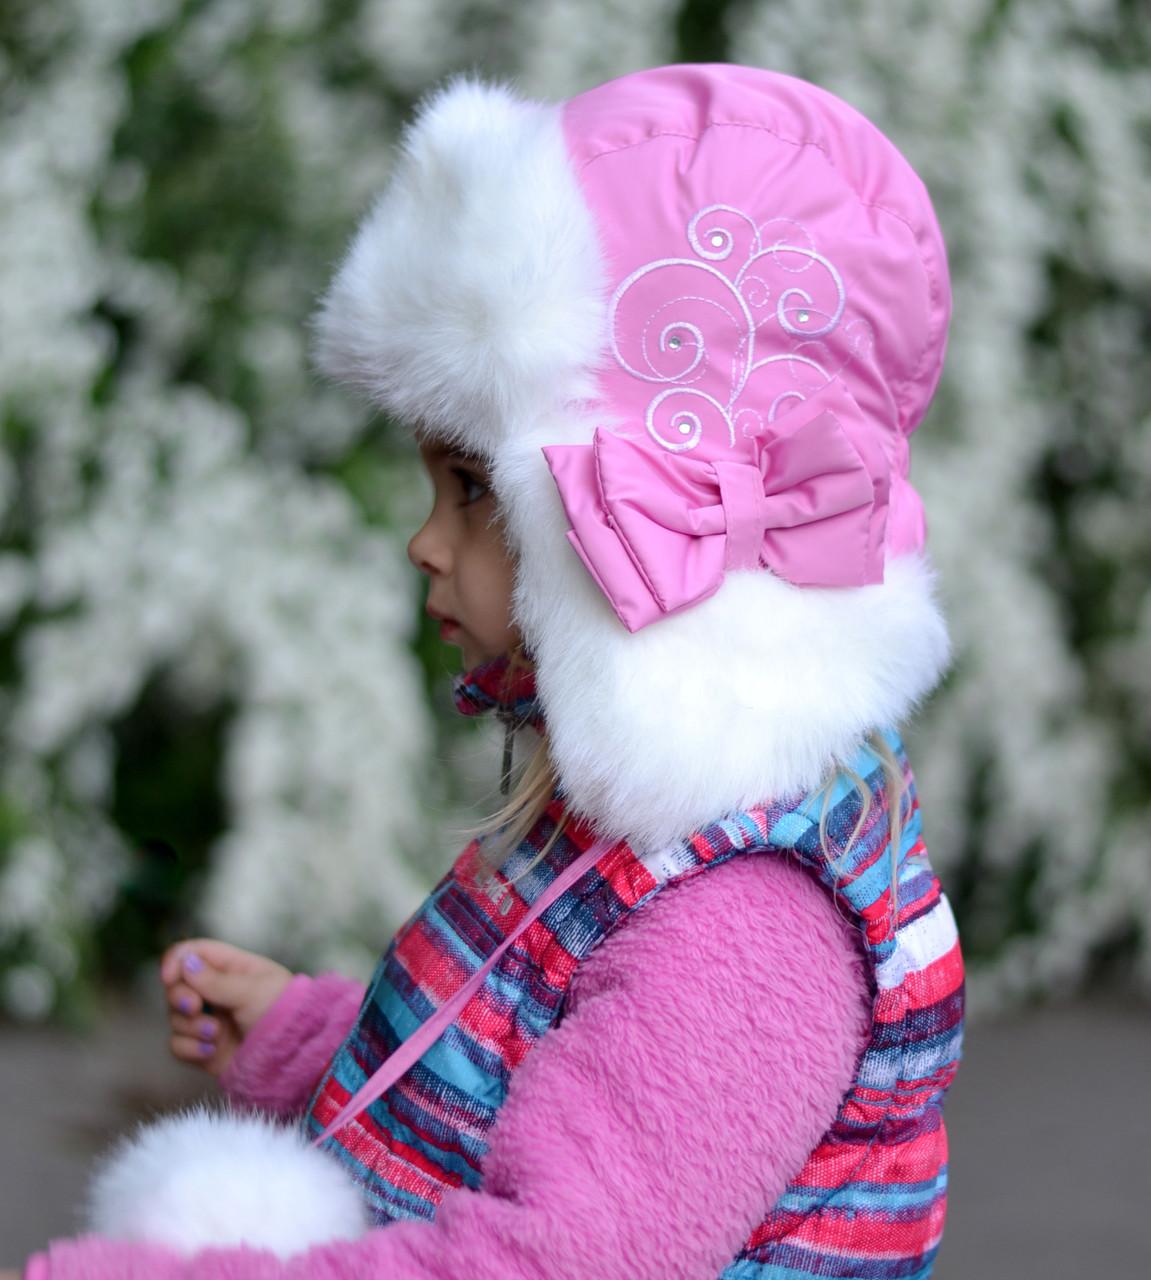 http://images.ua.prom.st/185606677_w640_h640_dsc_8448.jpg